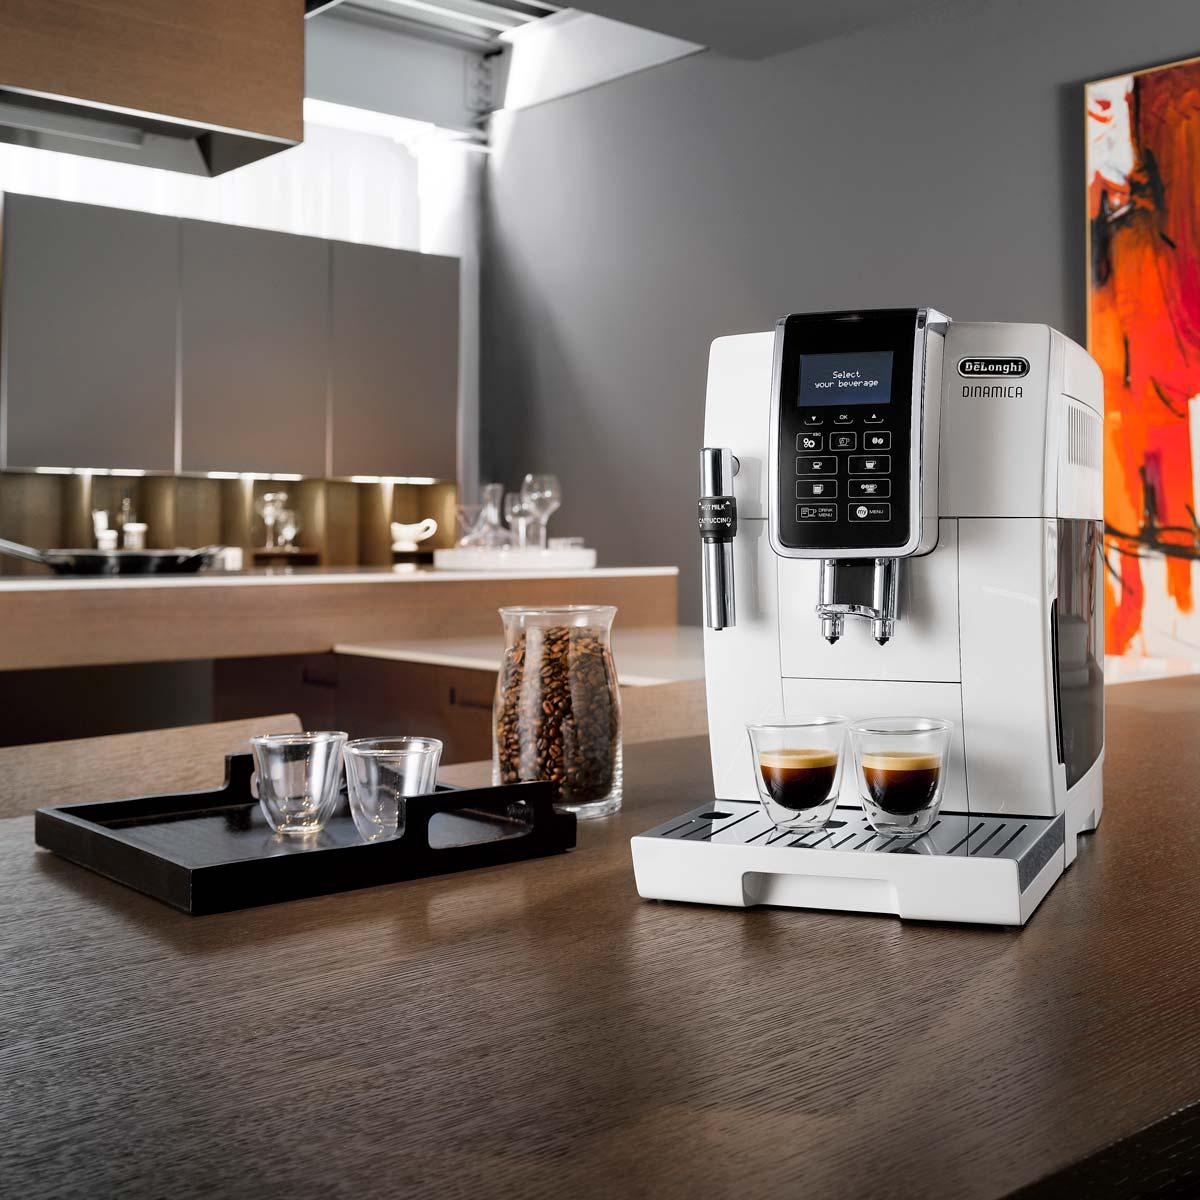 De'Longhi ECAM350.35.W Dinamica Bean-to-Cup Coffee Machine, White - COSTCO ONLINE for £299.89 (Costco member price or £314.95)